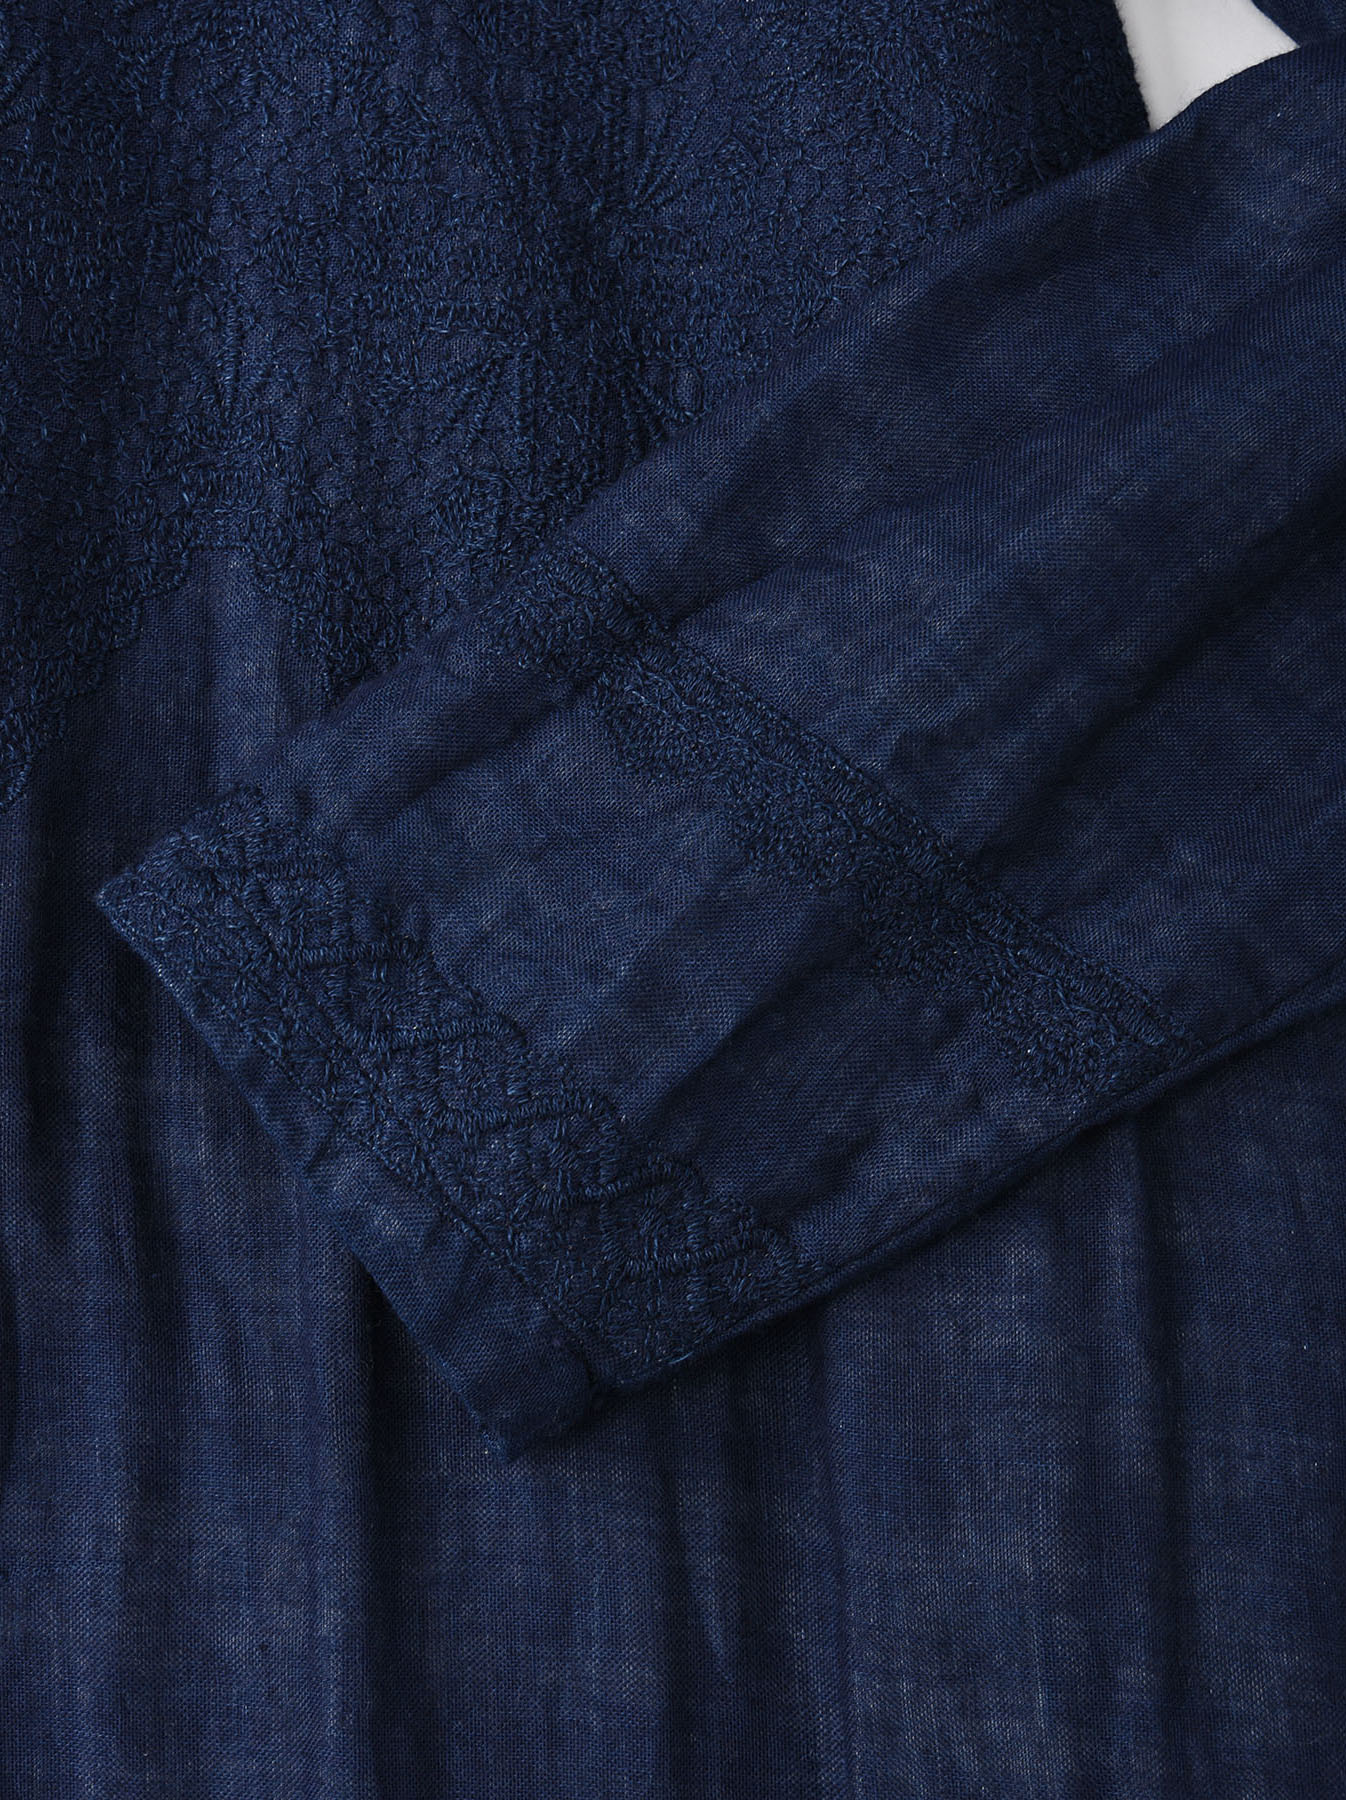 Indigo Double Cloth Lace Embroidery Dress-6